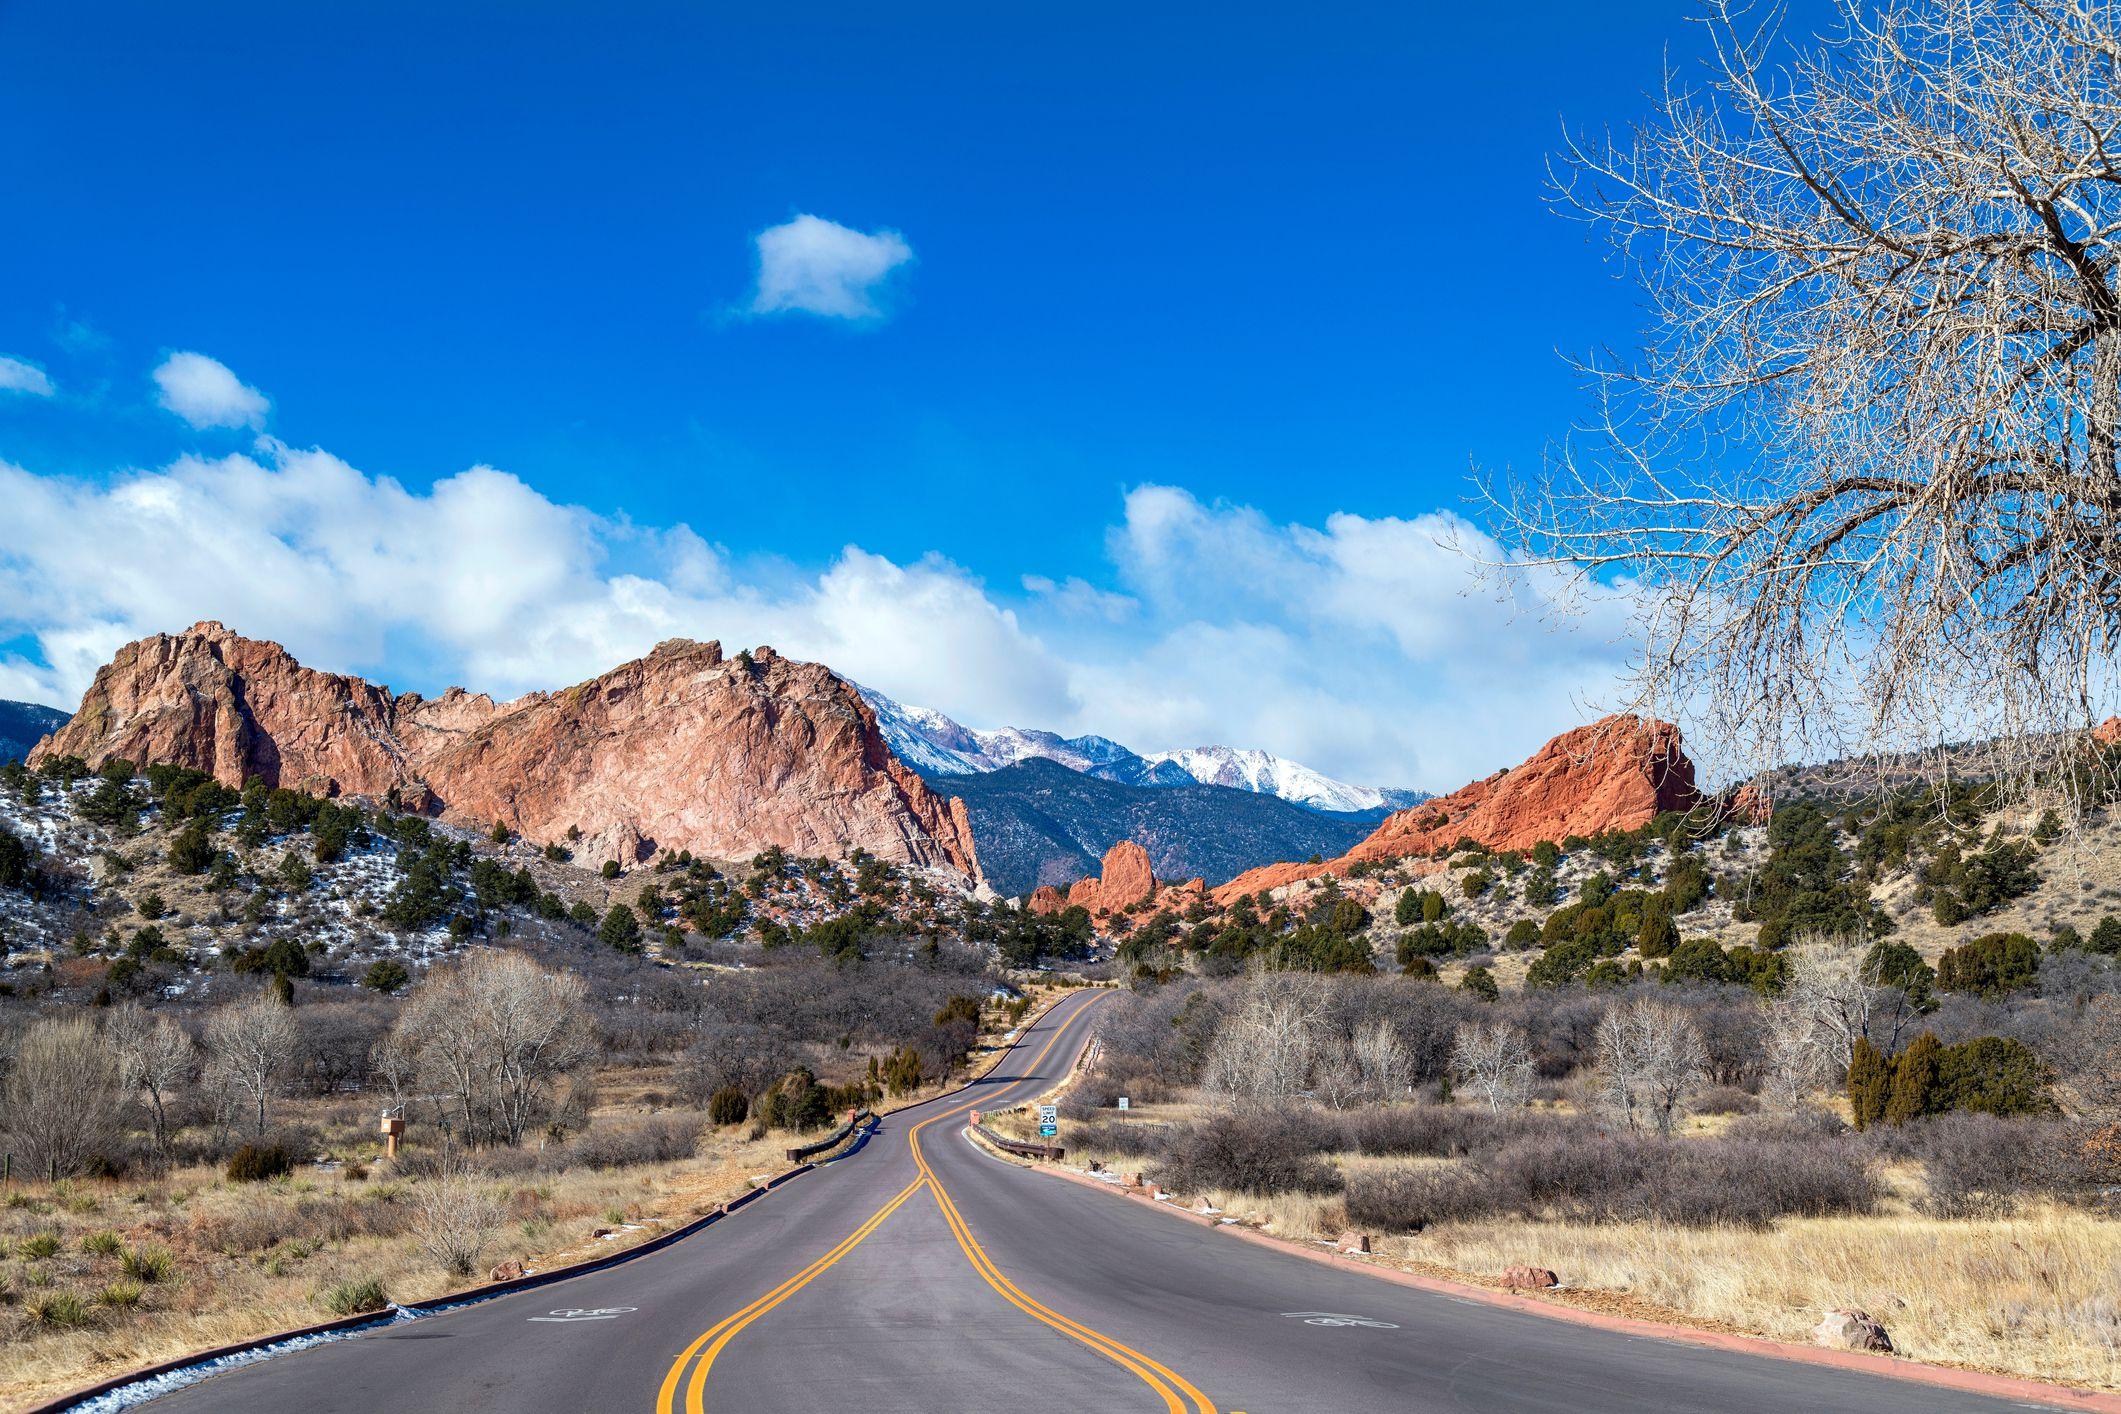 Cracking Colorado - Occidental Dissent